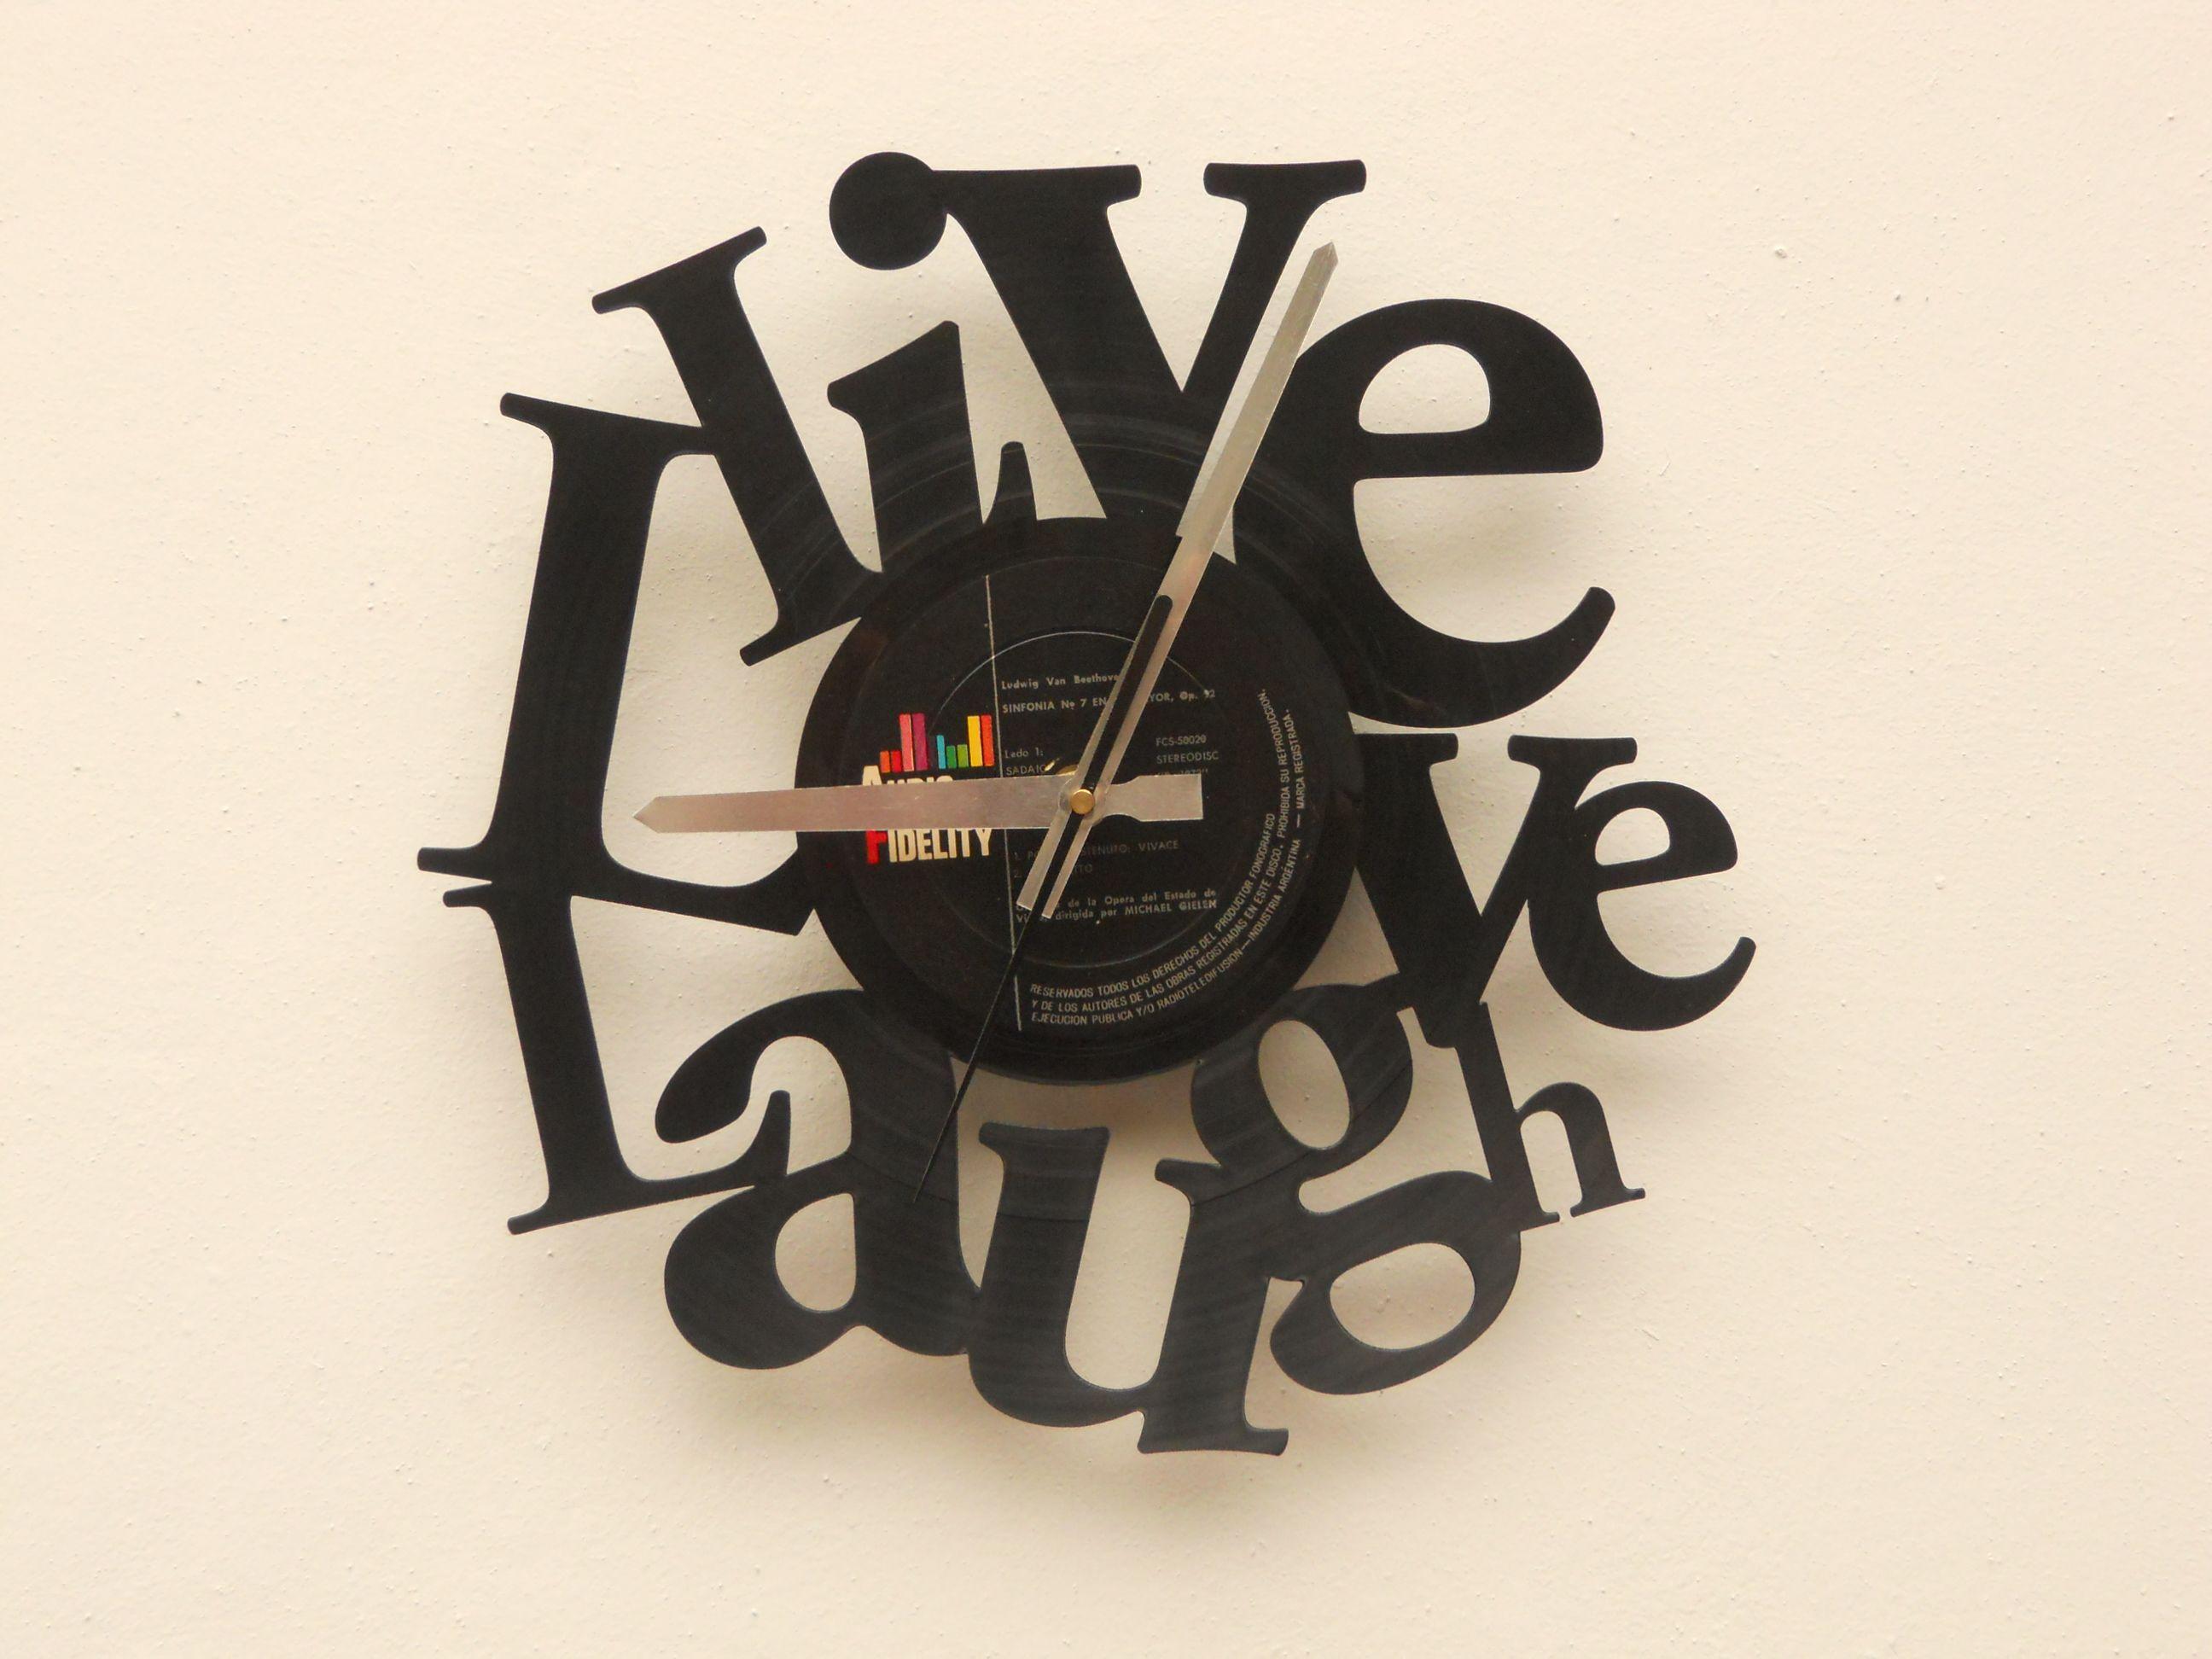 Reloj de pared calado en disco de vinilo laser cutting - Mecanismo reloj pared barato ...